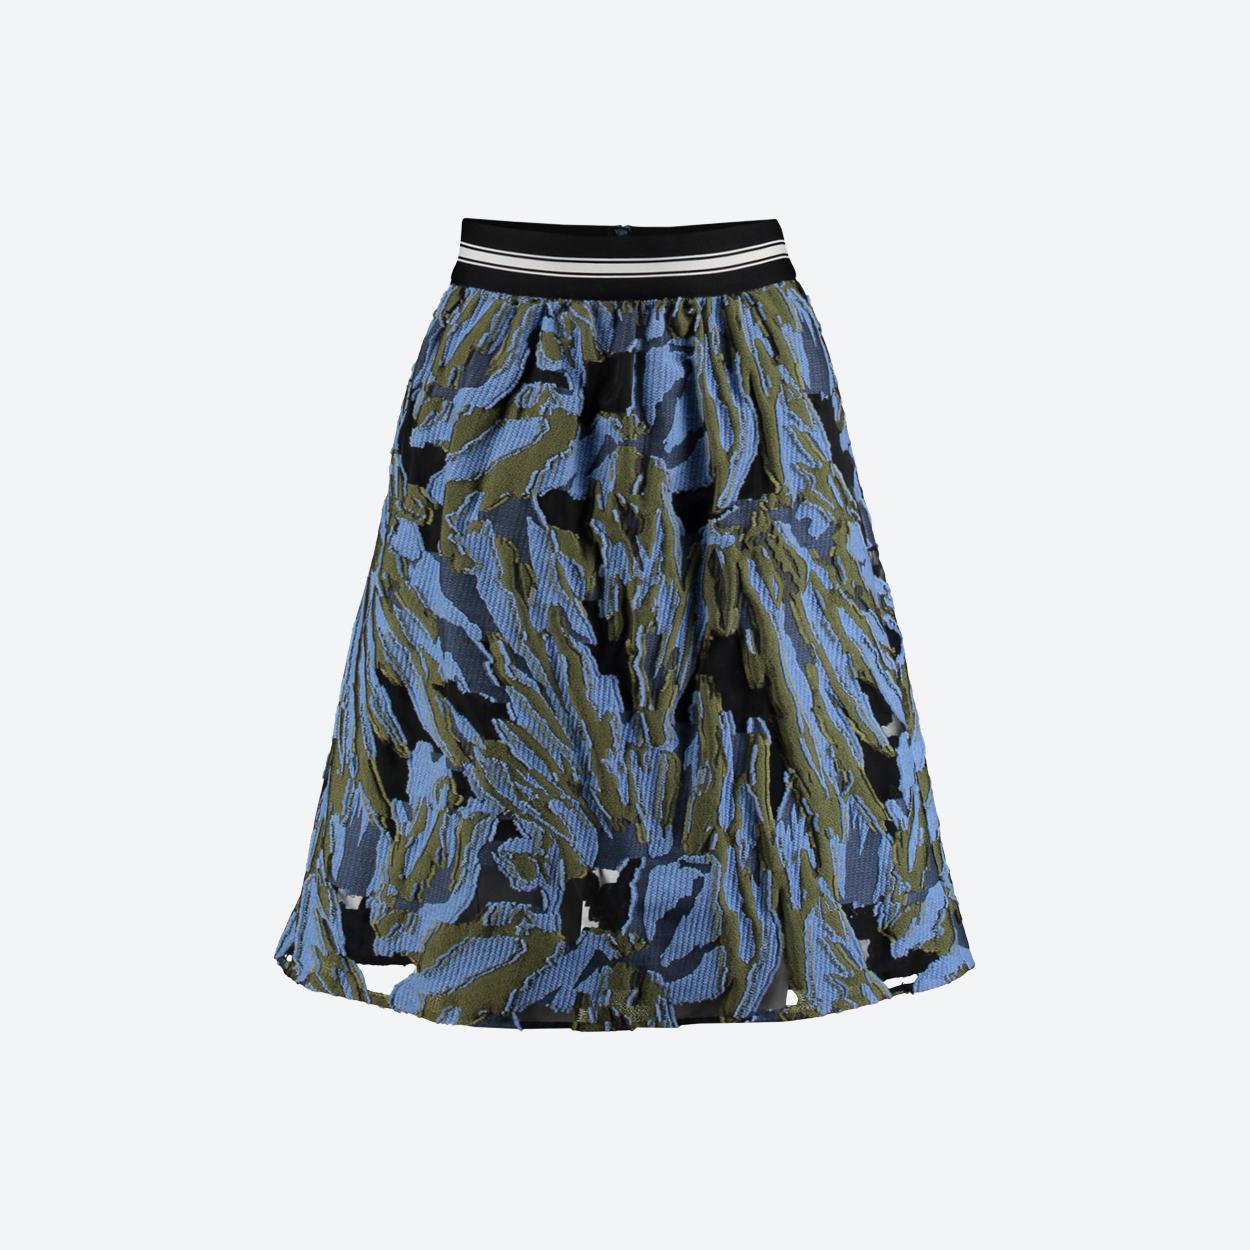 Dorothee Schumacher Vivid Passion Skirt